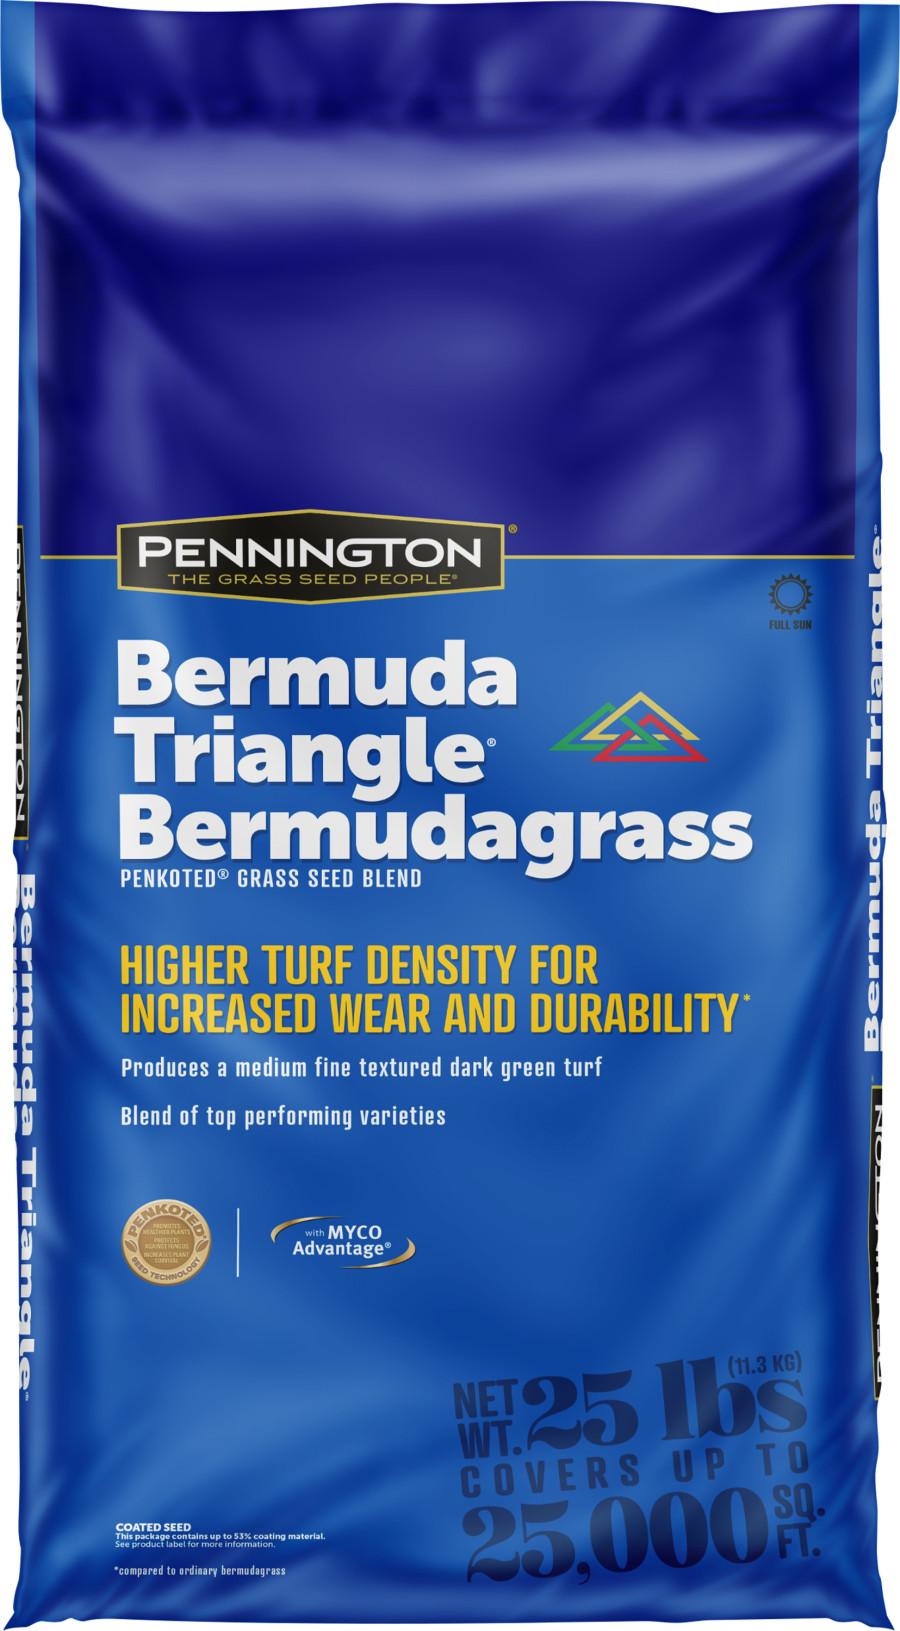 Pennington Bermuda Triangle Certified Bermudagrass Seed Blend with MYCO 1ea/25 lb